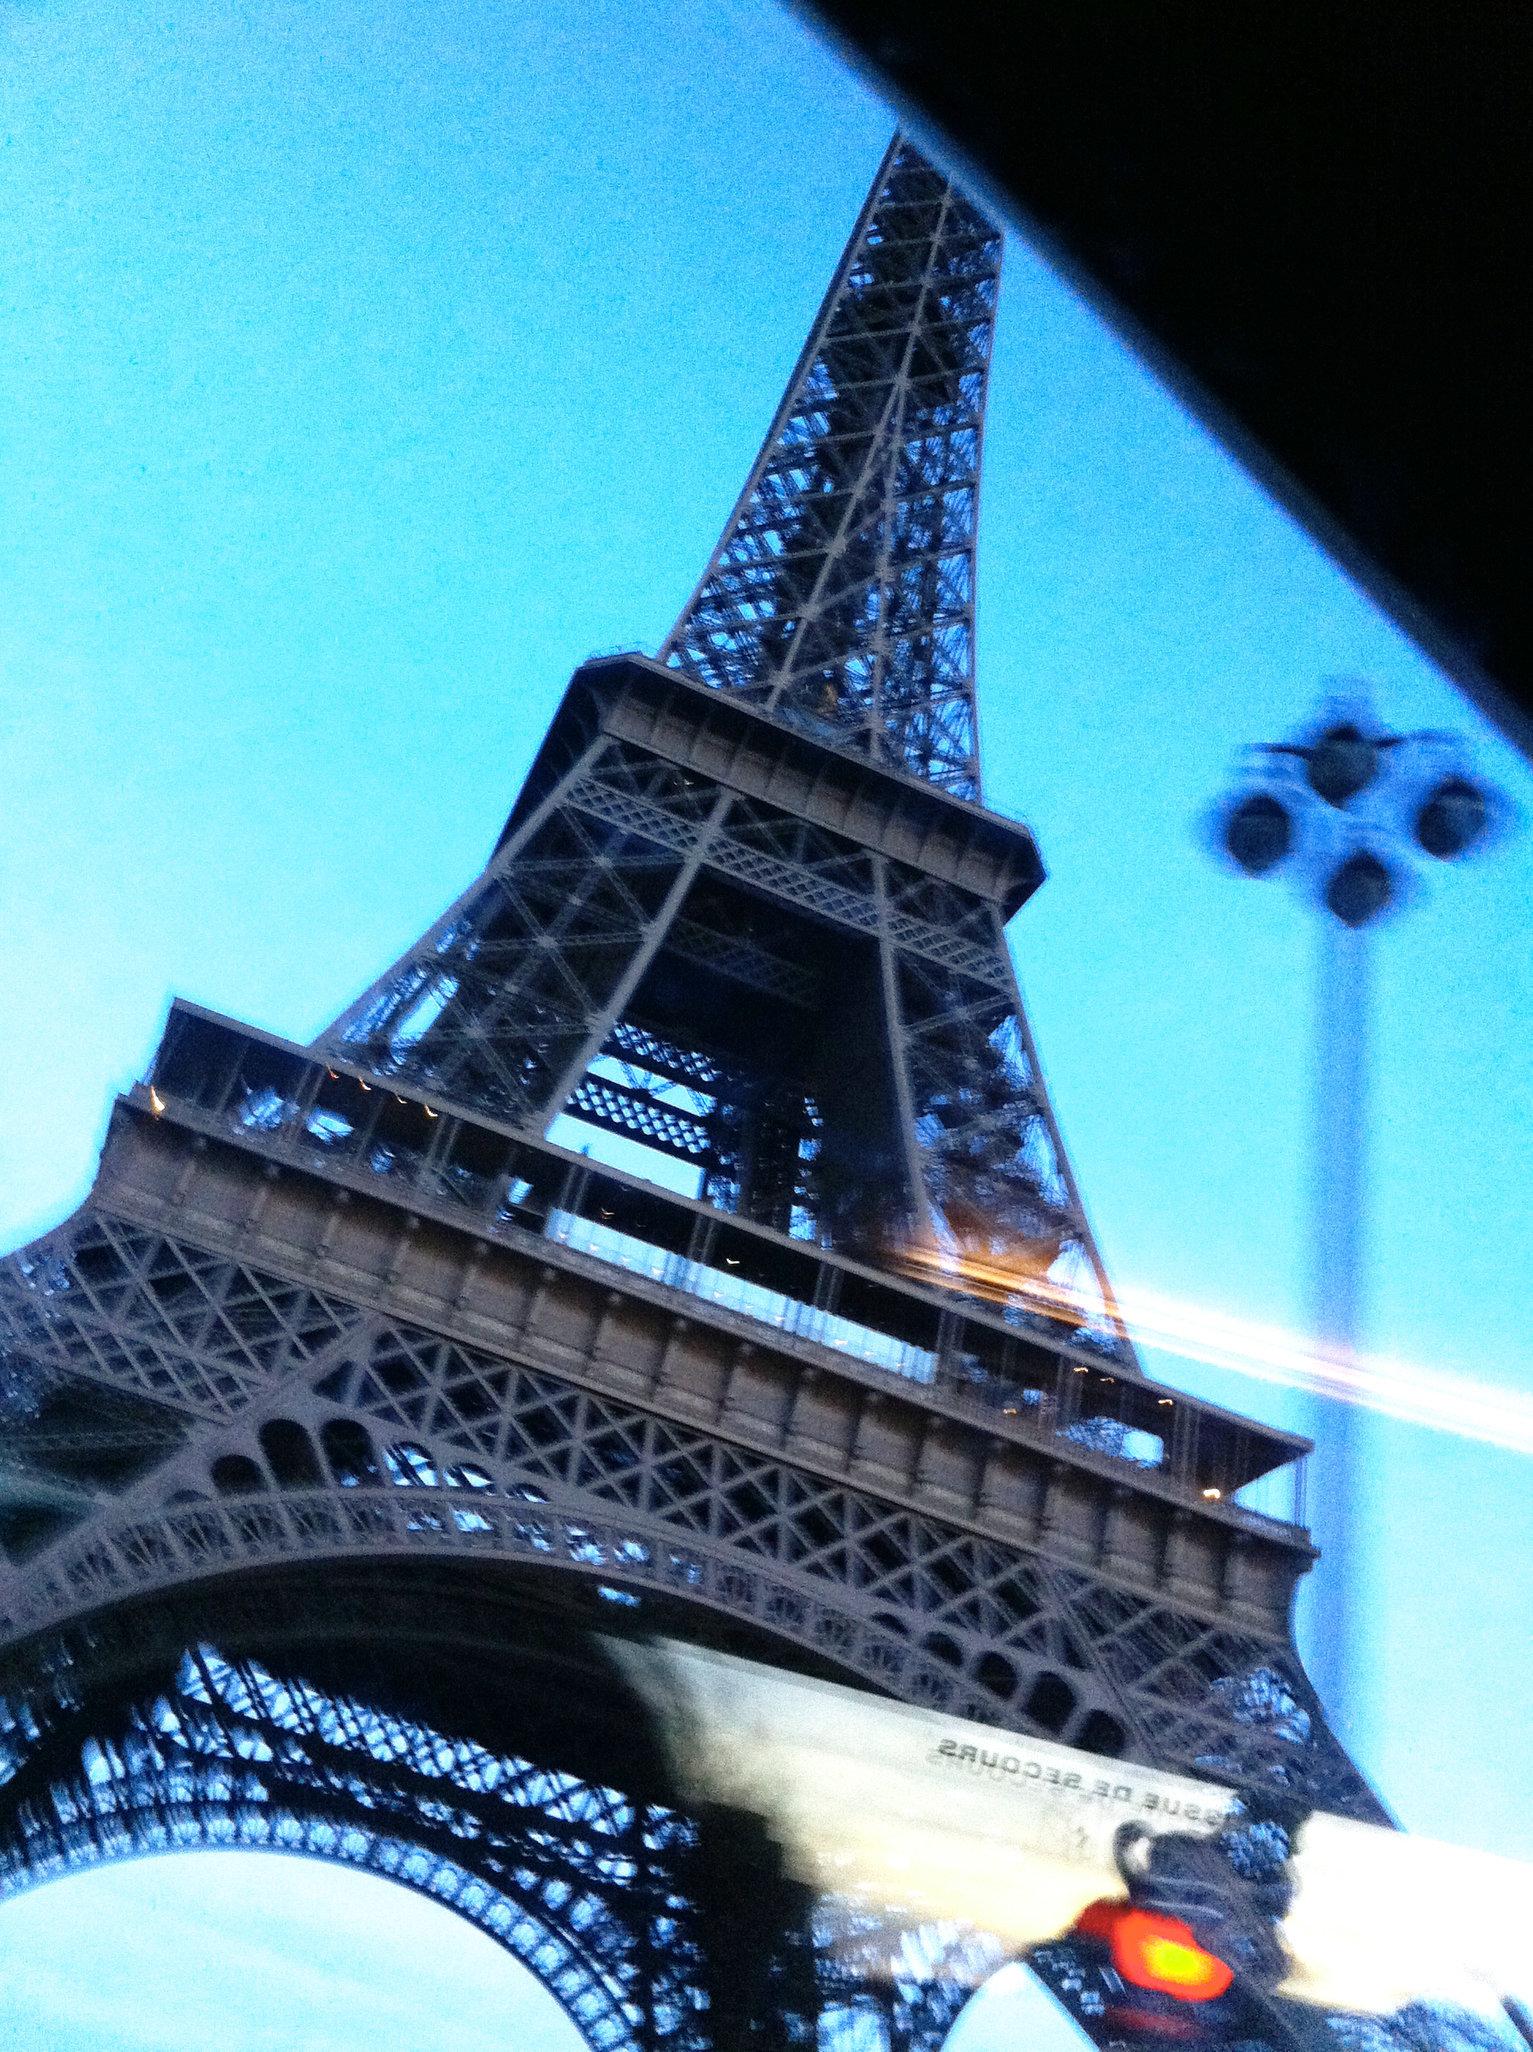 © CORDAY - Eiffel In Motion, No. 1